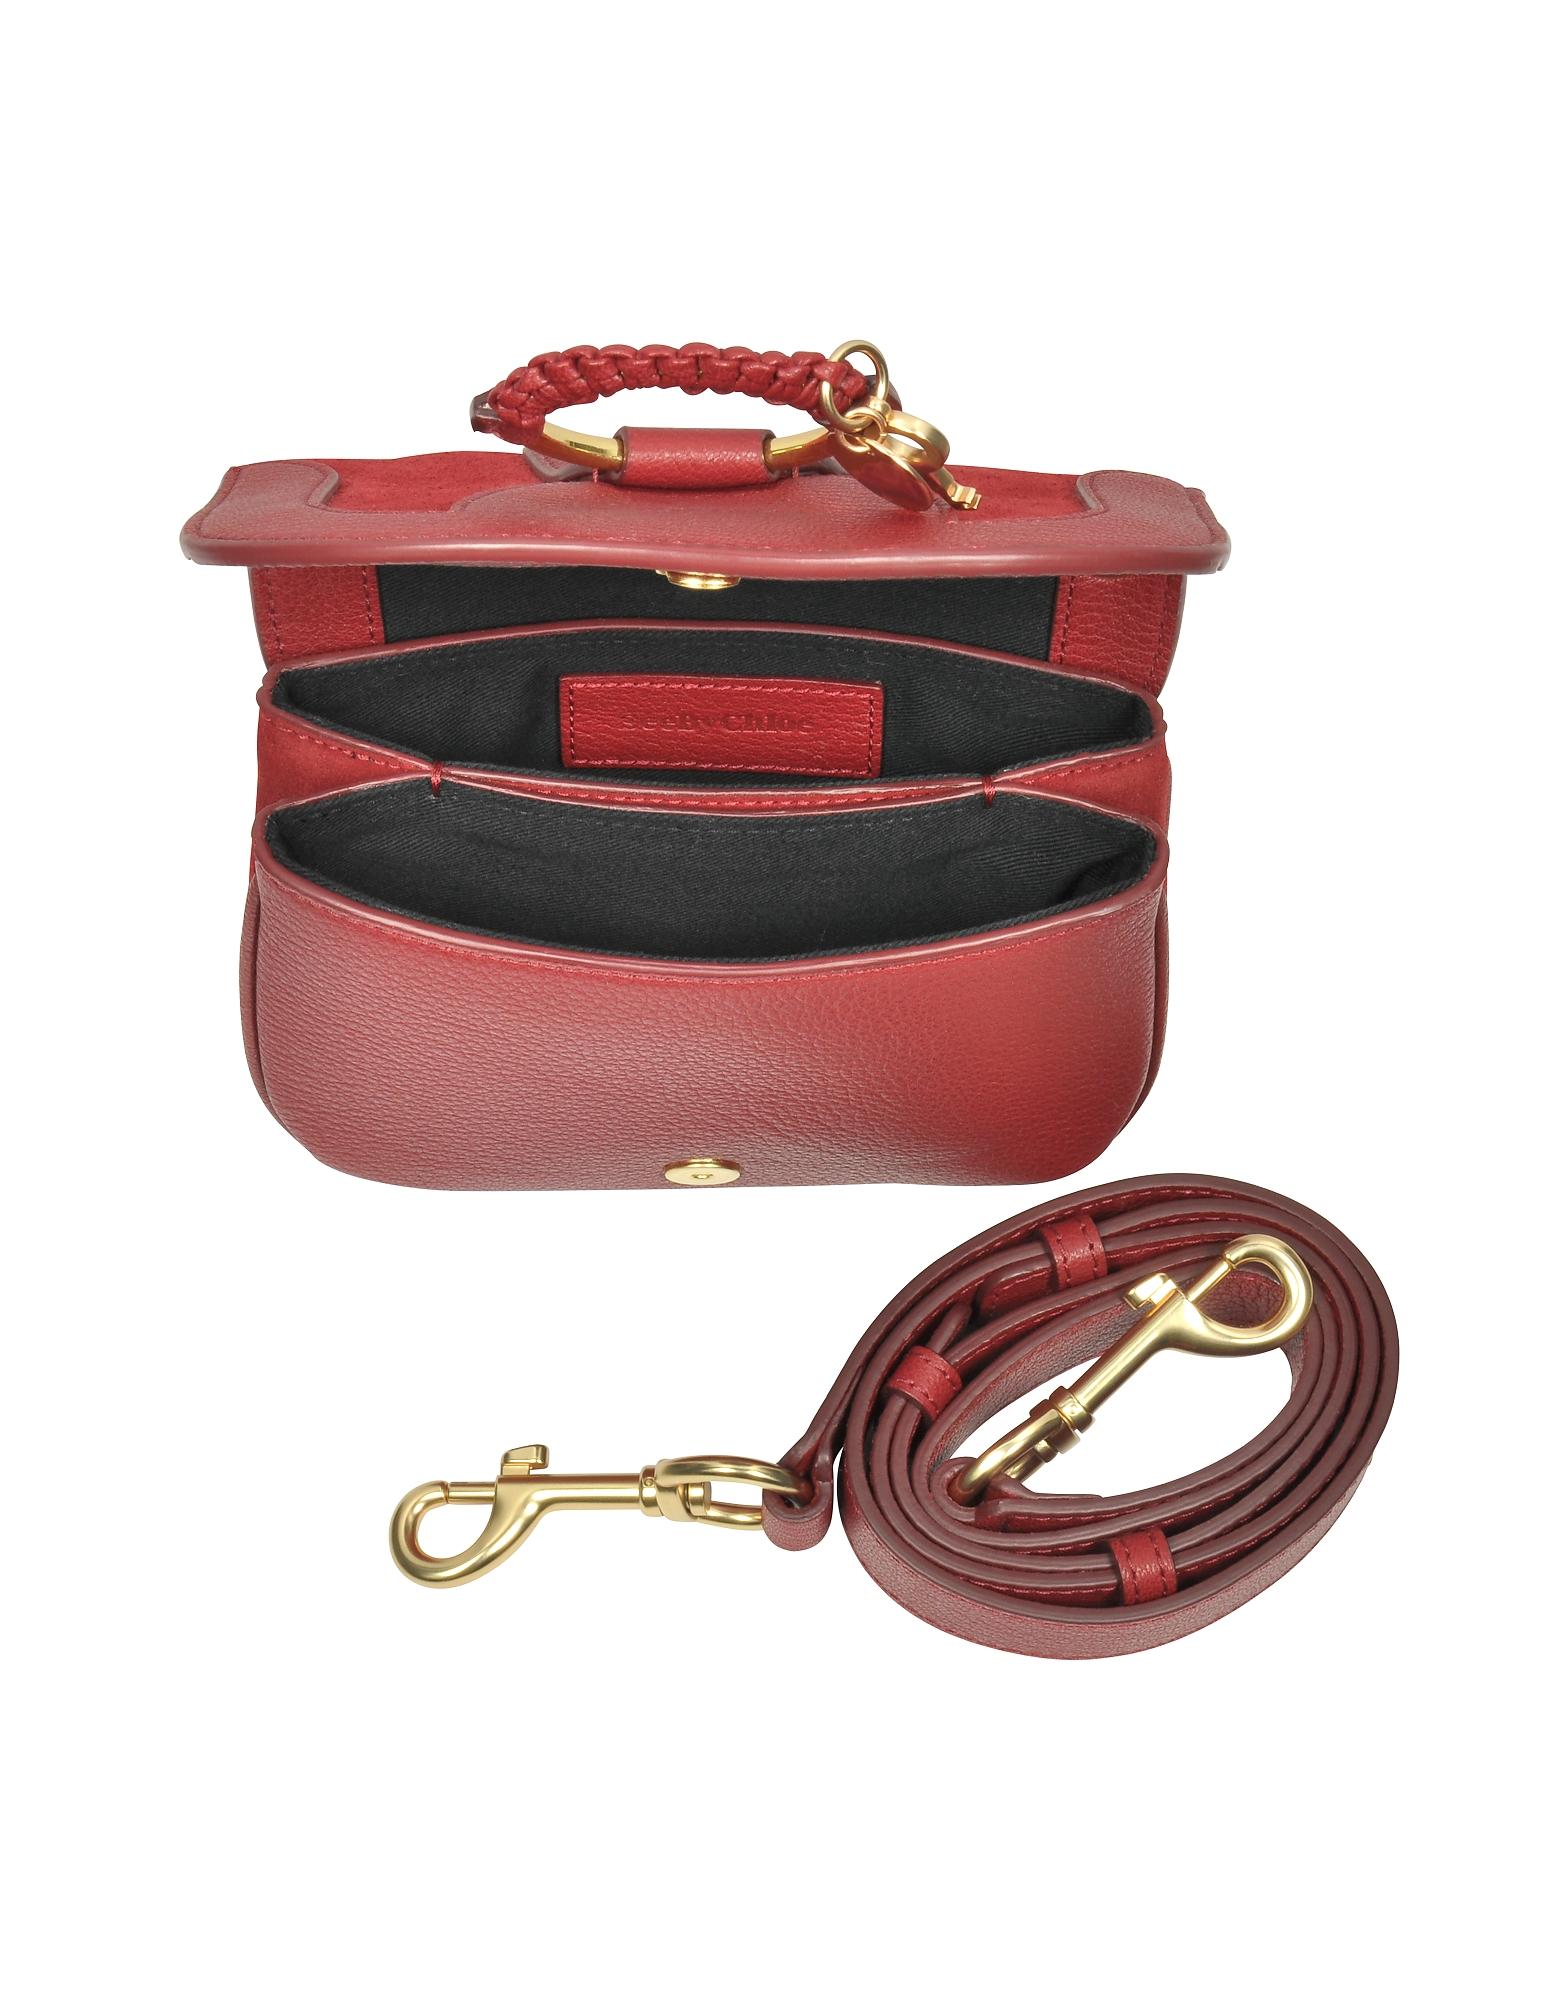 Hana Red Velvet Leather & Suede Small Crossbody Bag от Forzieri.com INT